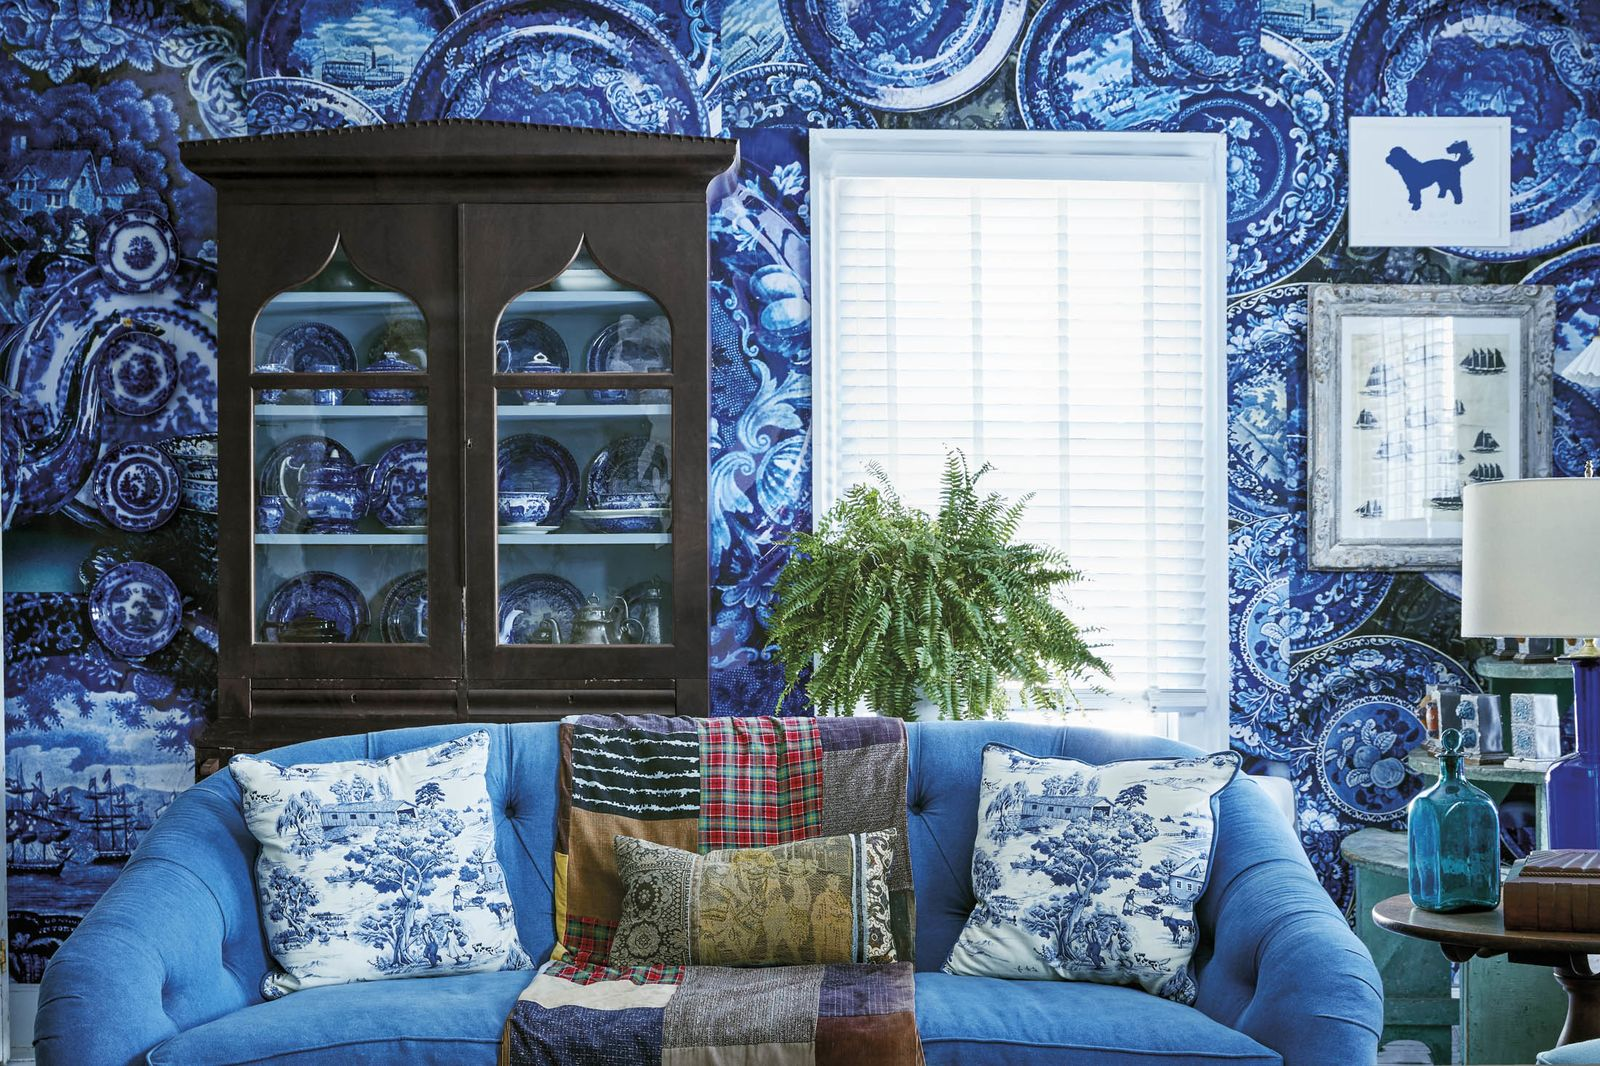 Sean Scherer's living room